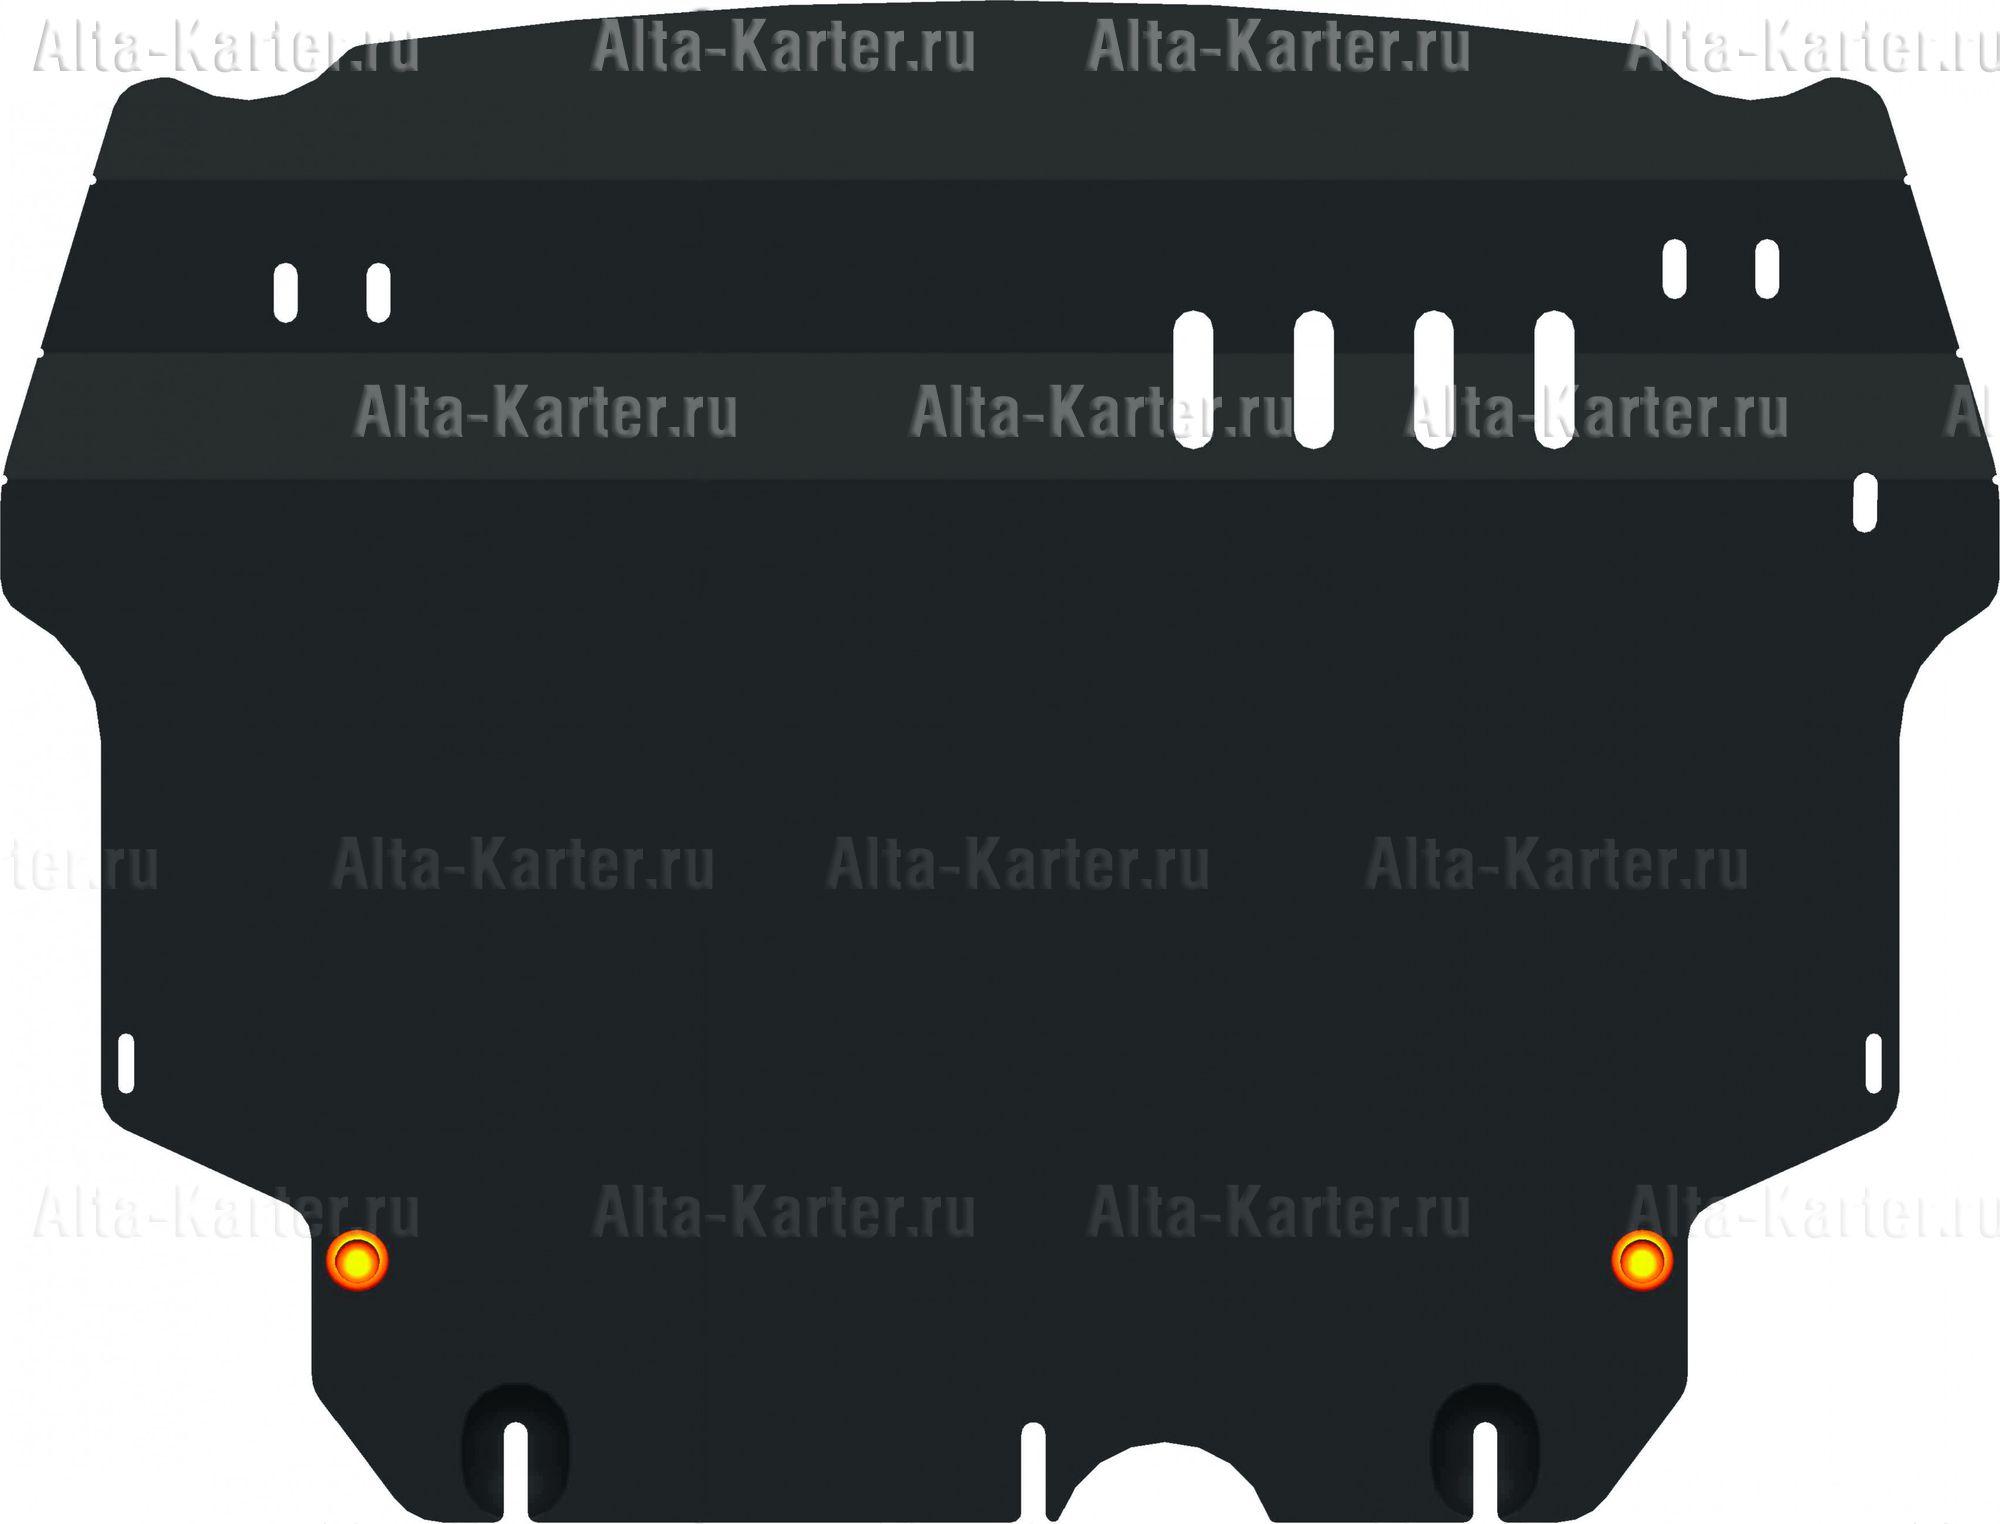 Защита Alfeco для картера и КПП Volkswagen Beetle A5 2013-2019. Артикул ALF.26.40